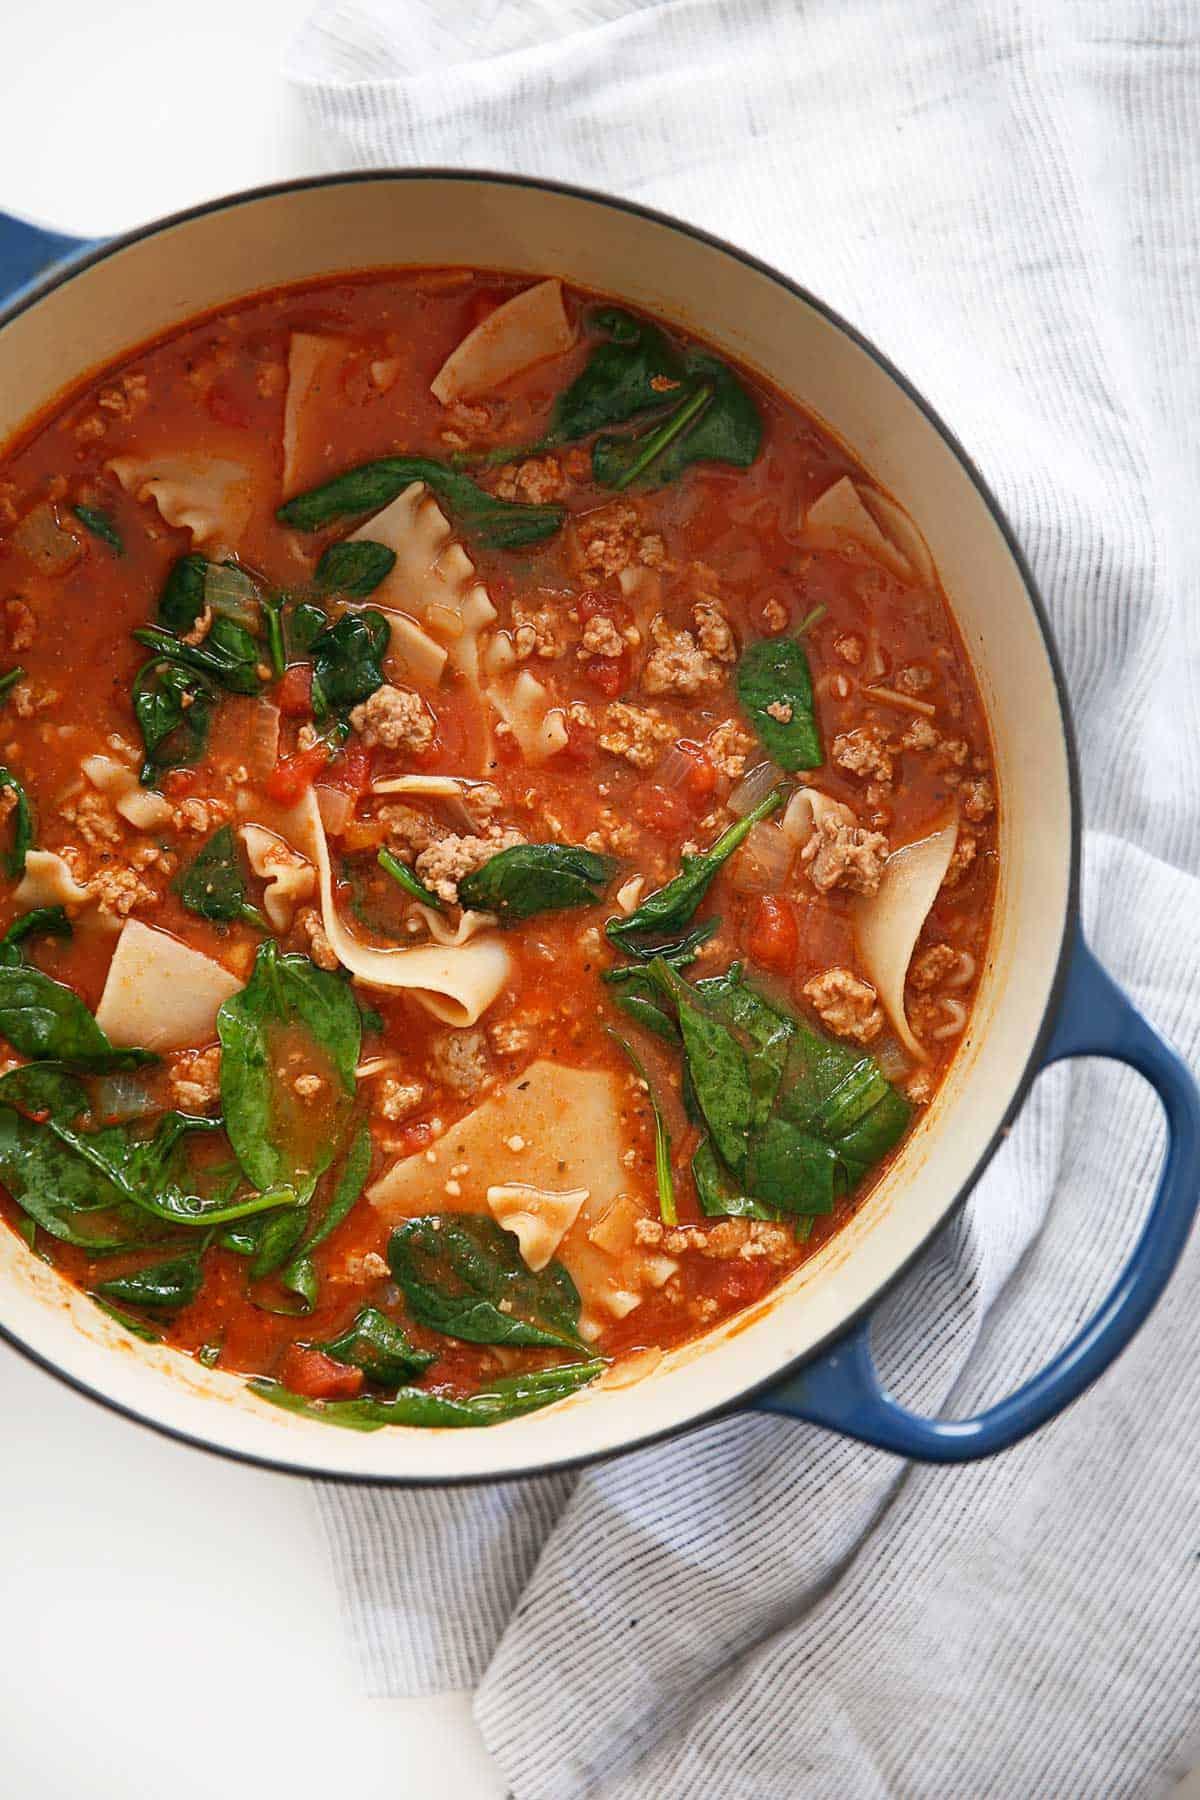 One-Pot Gluten-Free Lasagna Soup (Easy, Gluten-Free) - Lexi's Clean Kitchen